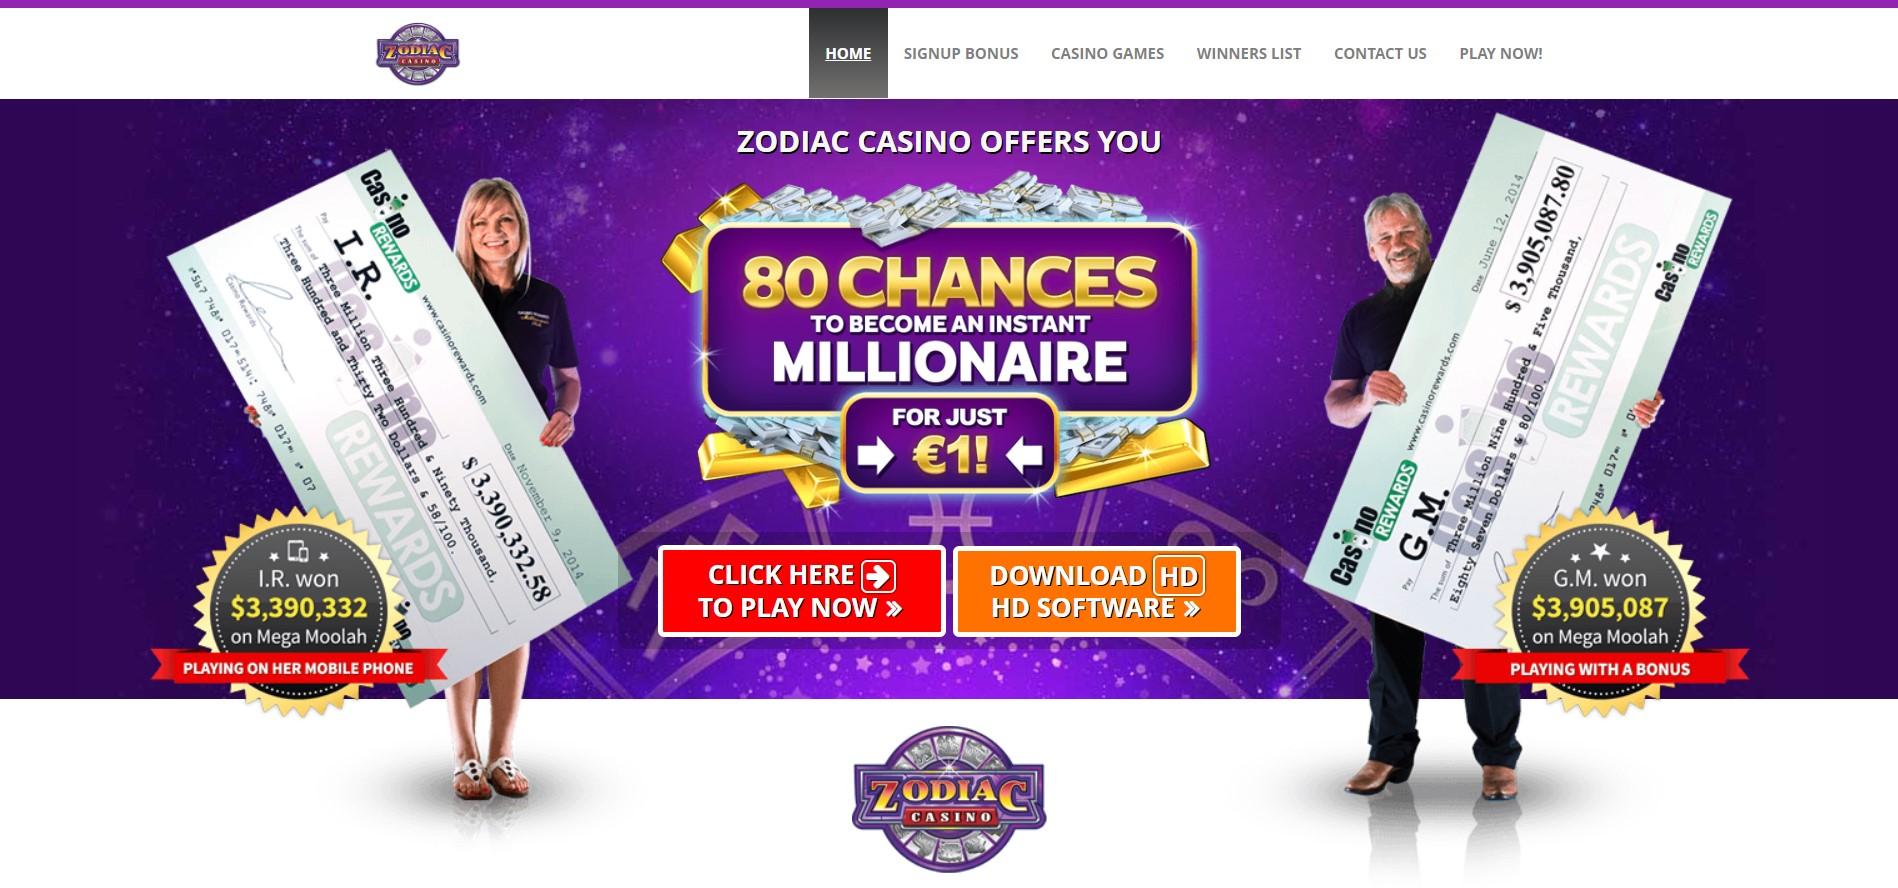 Zodiac Casino welcome